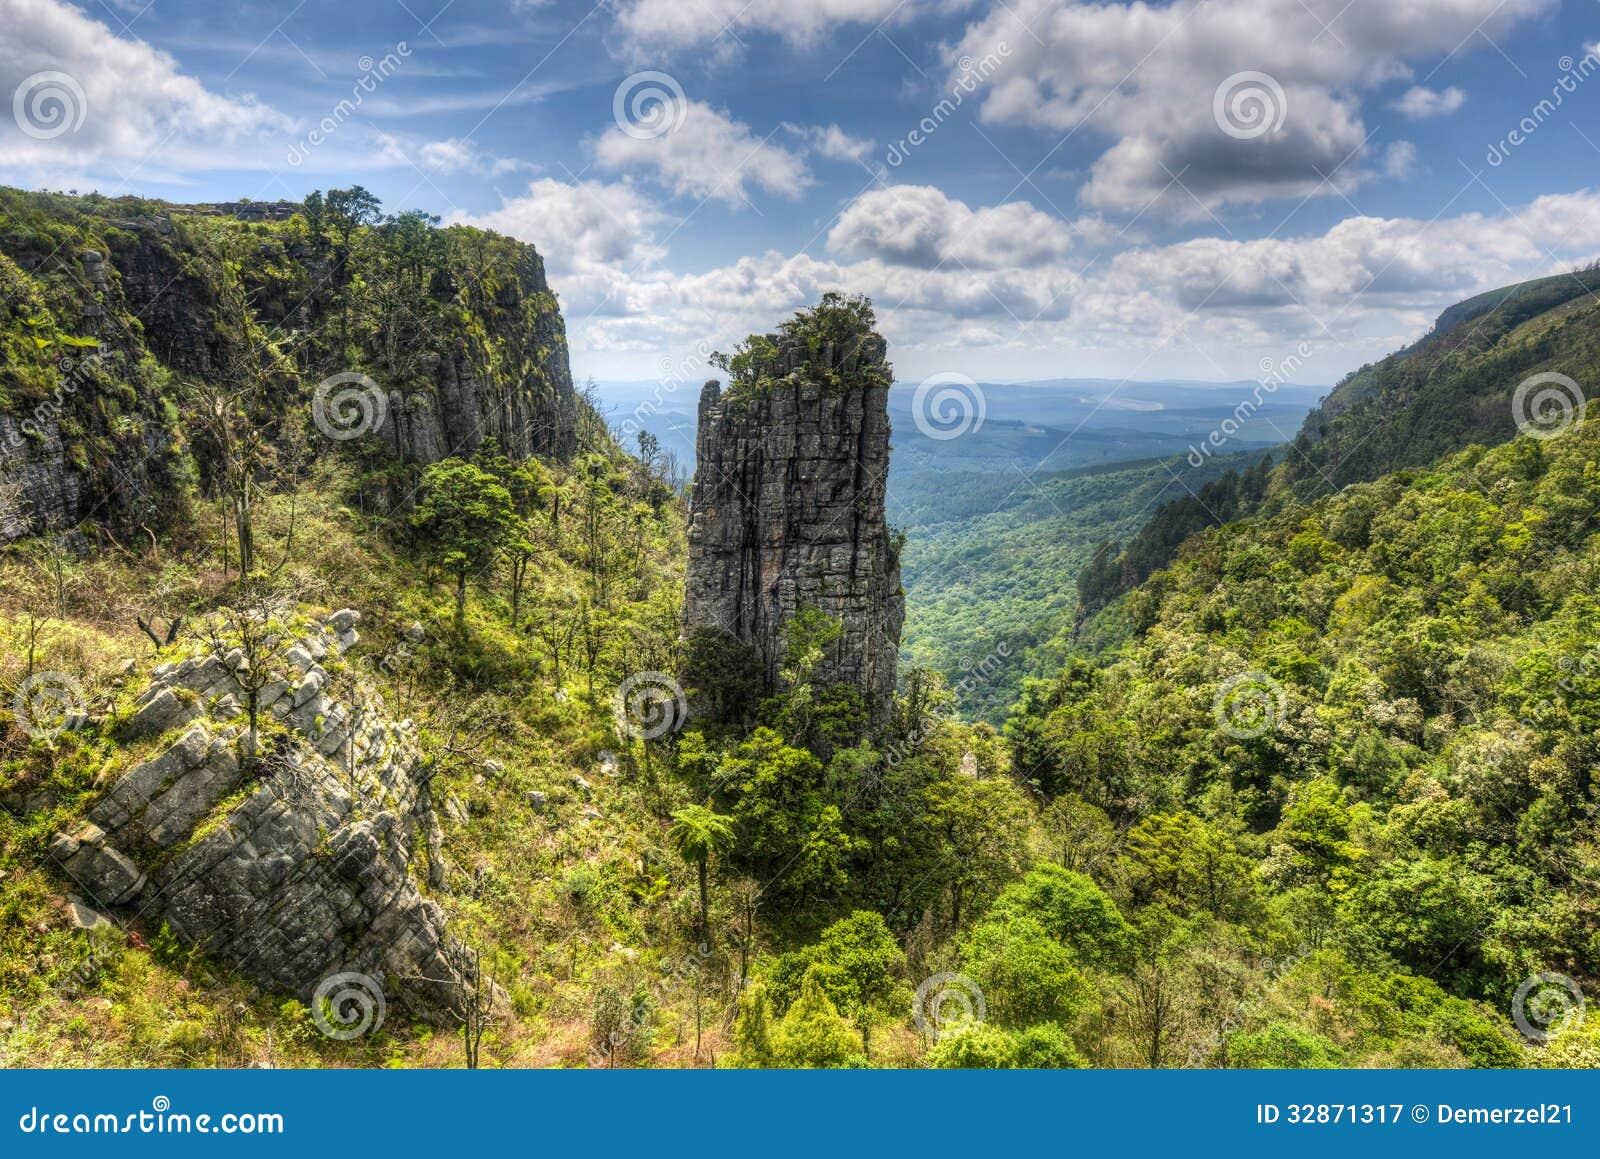 Pinnacle Rock, Mpumalanga, South Africa Stock Image ...